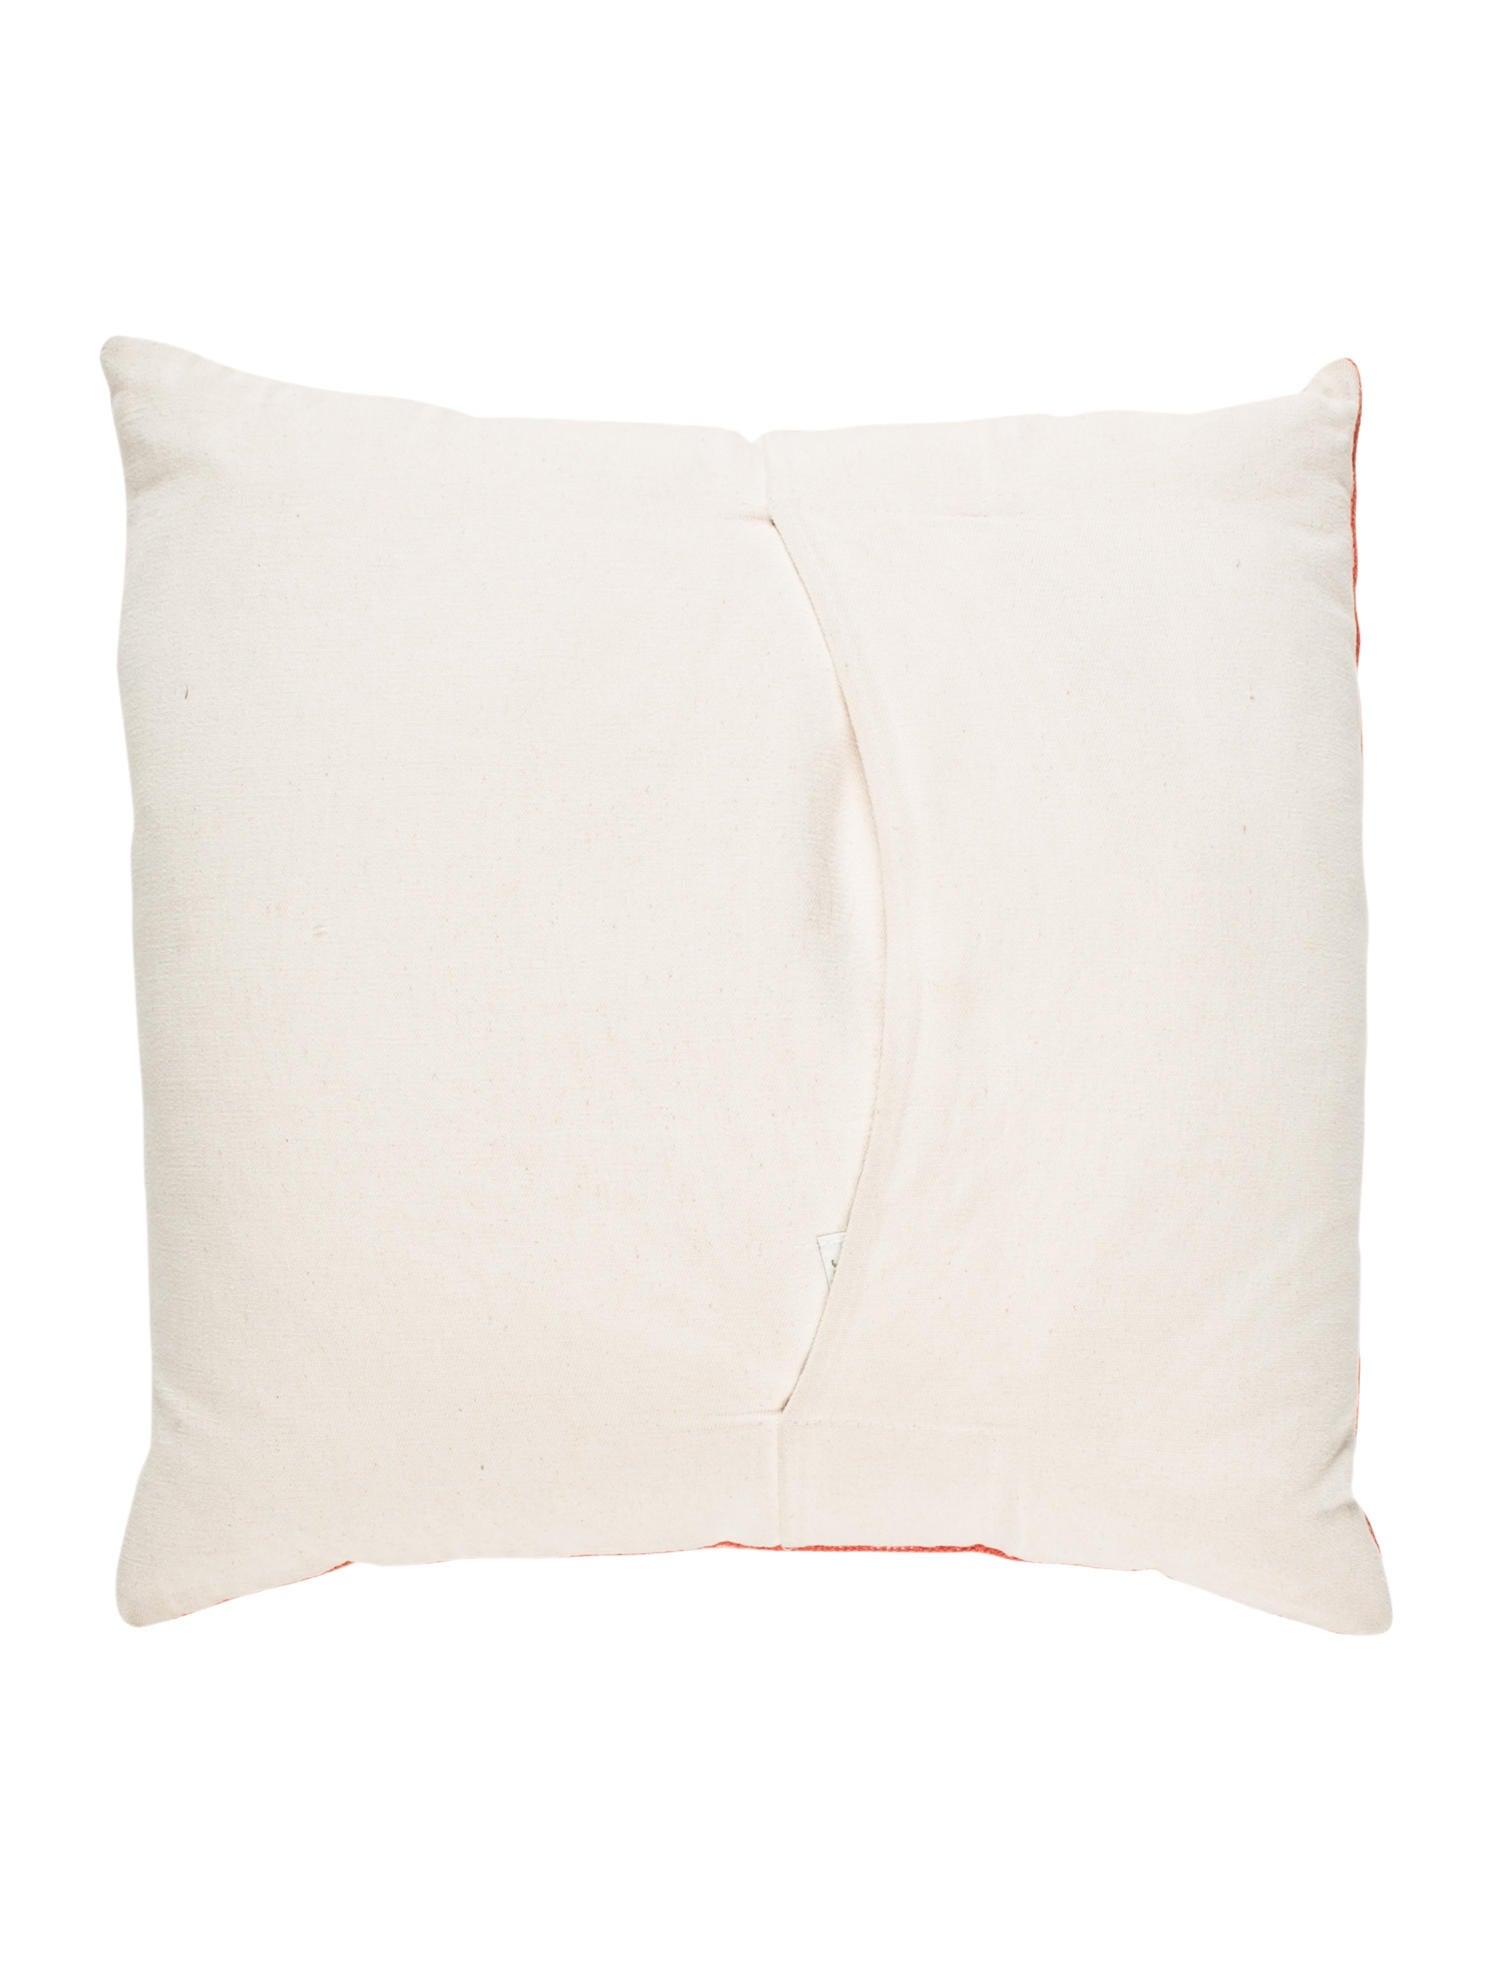 Throw Pillow Judy Ross Throw Pillow - Pillows And Throws - PILLO20243 The RealReal